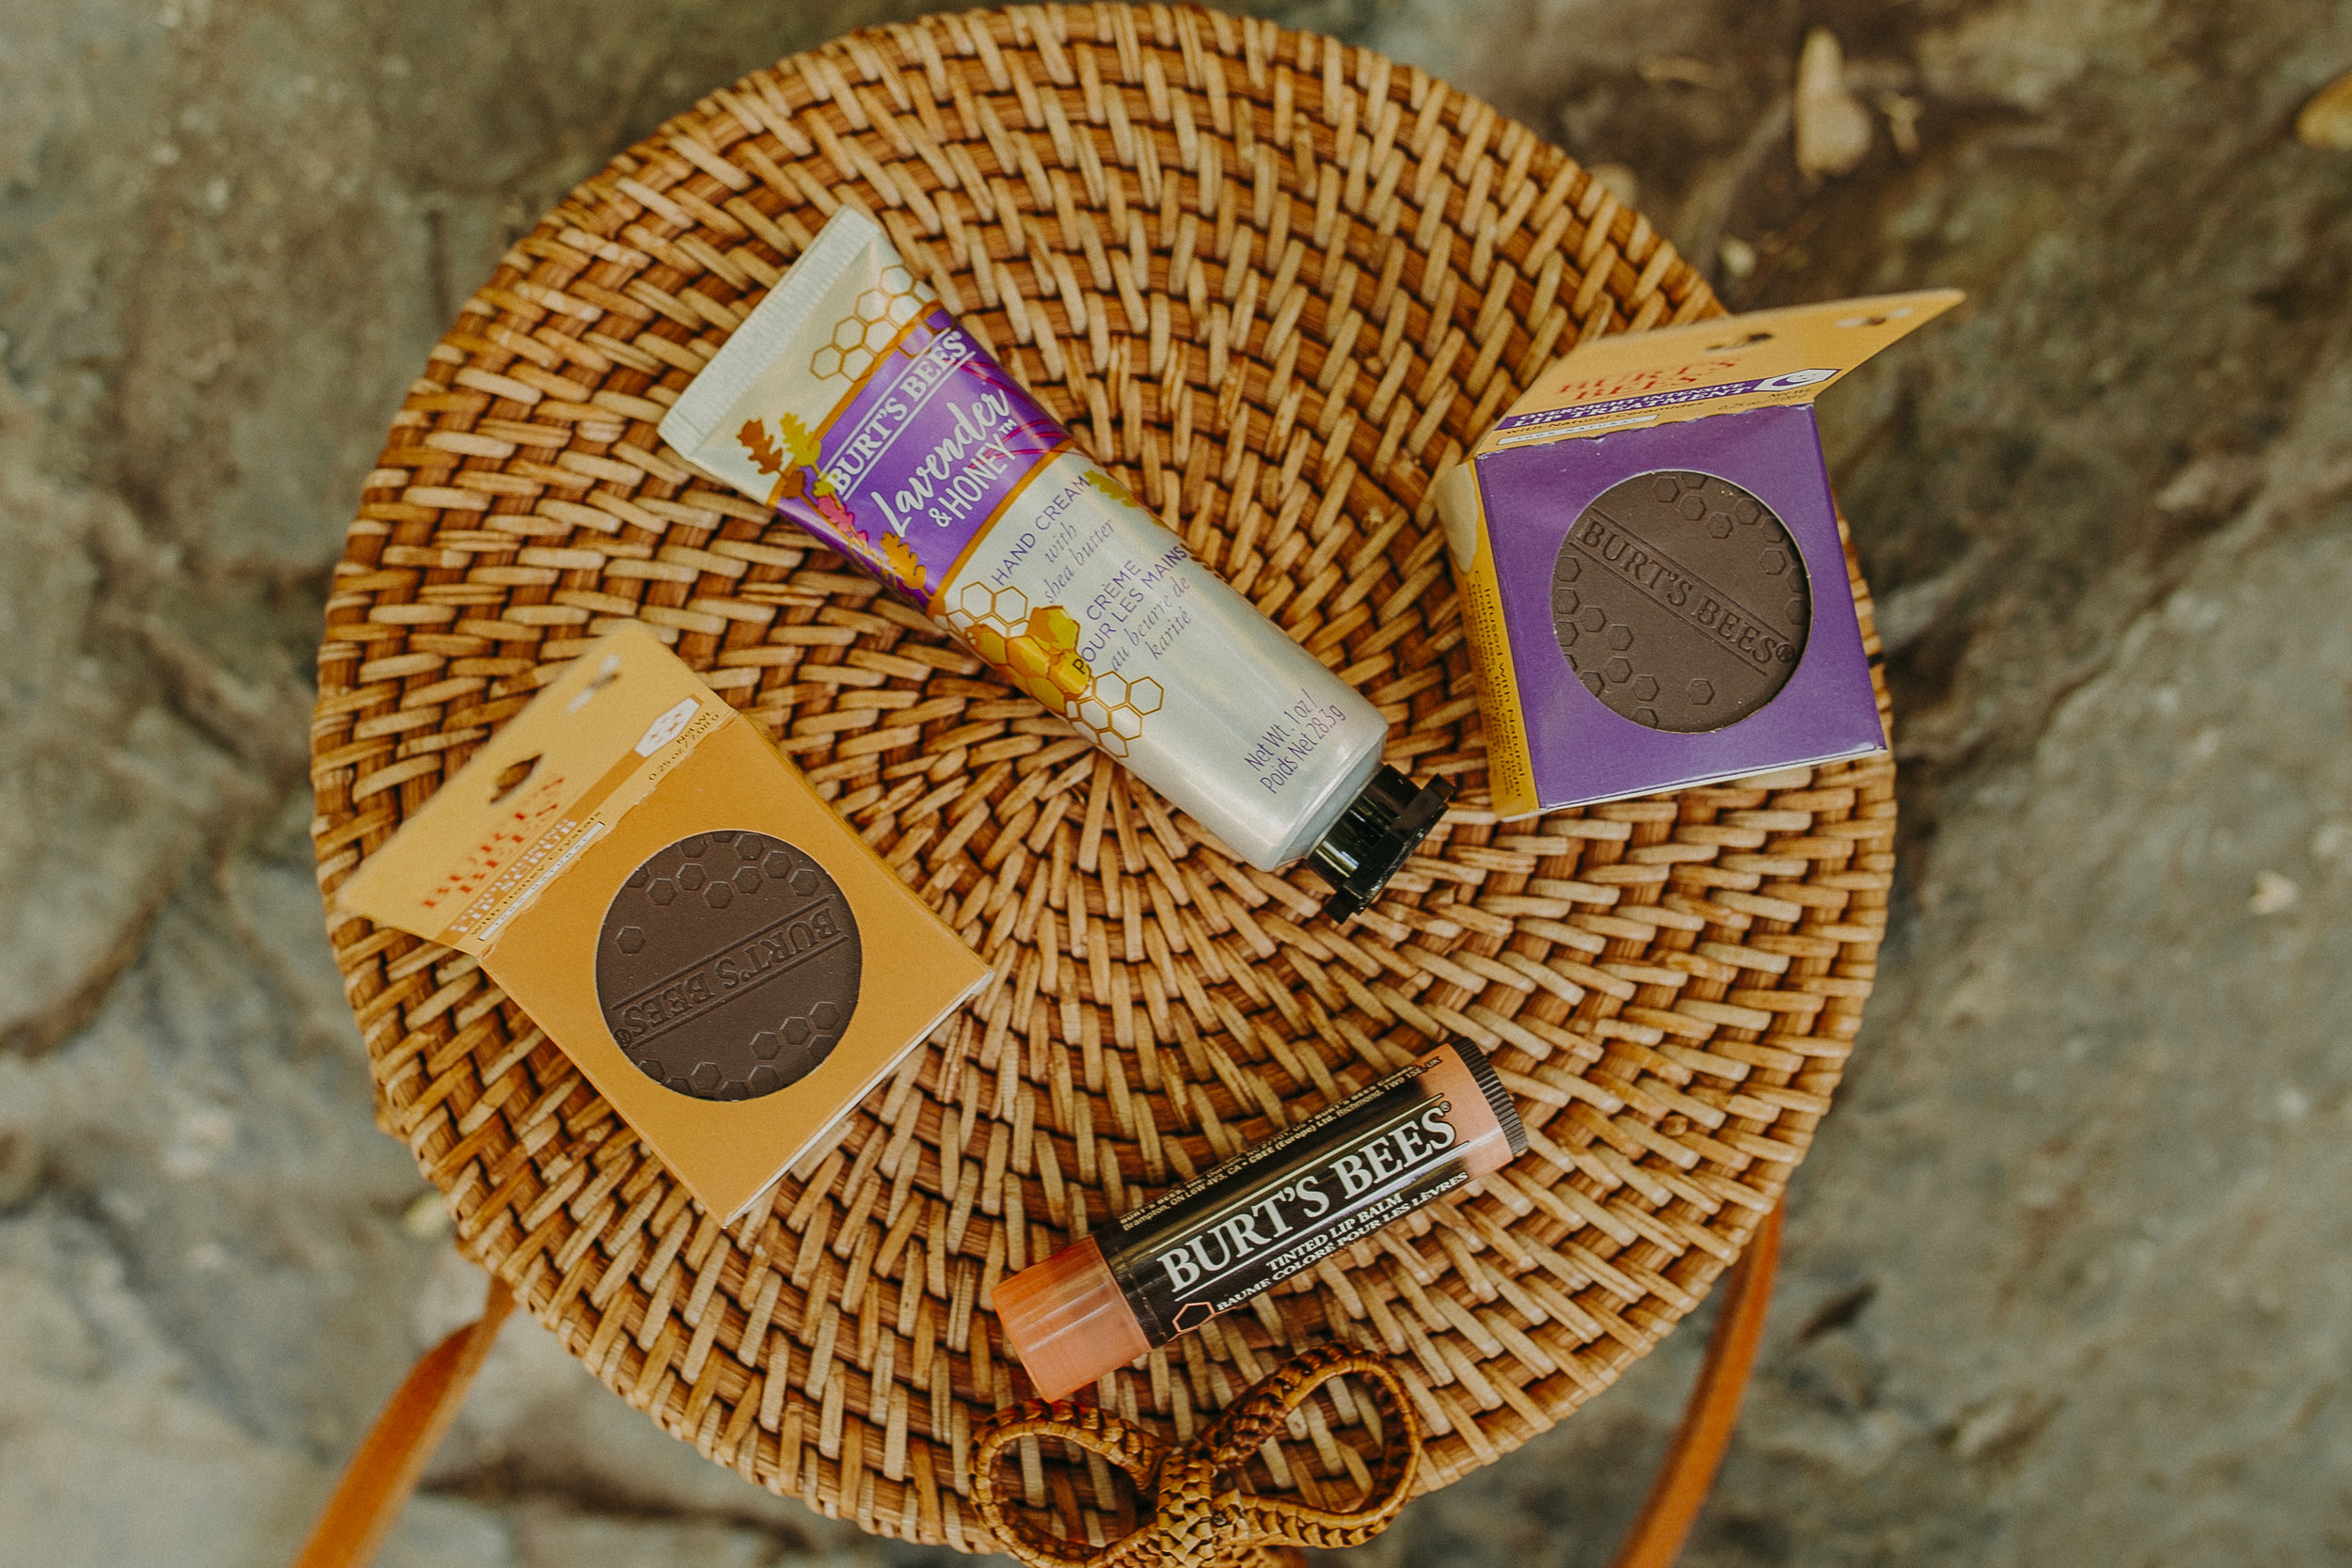 burts-bees-fall-lip-products-26.jpg